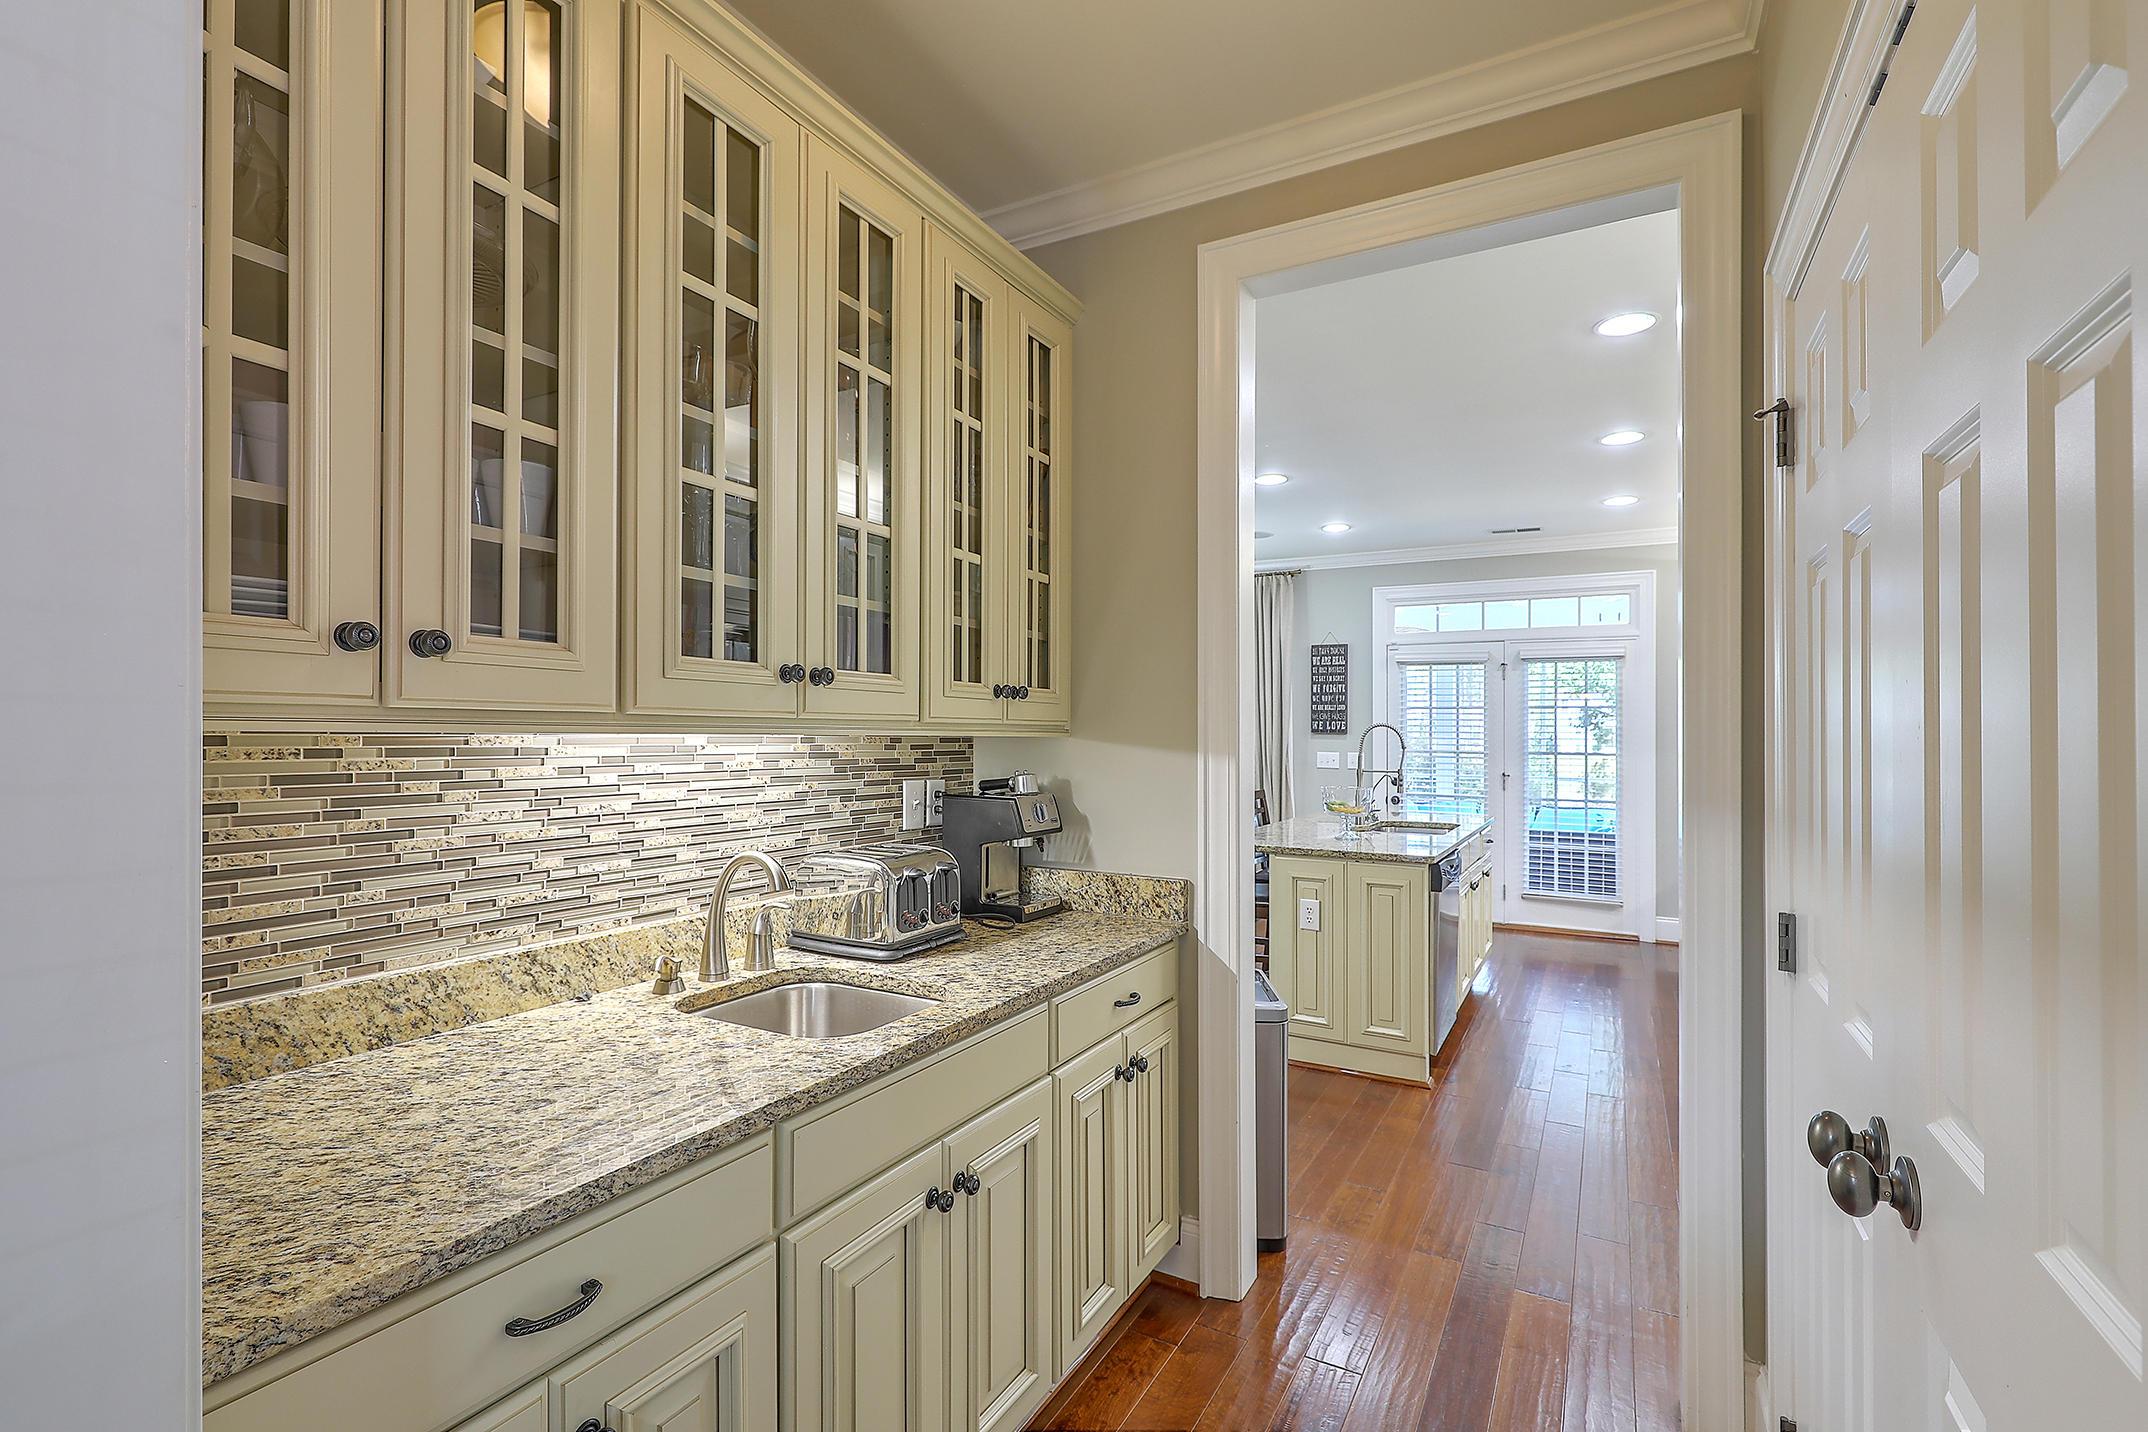 Branch Creek Homes For Sale - 304 Pond Hill, Summerville, SC - 25